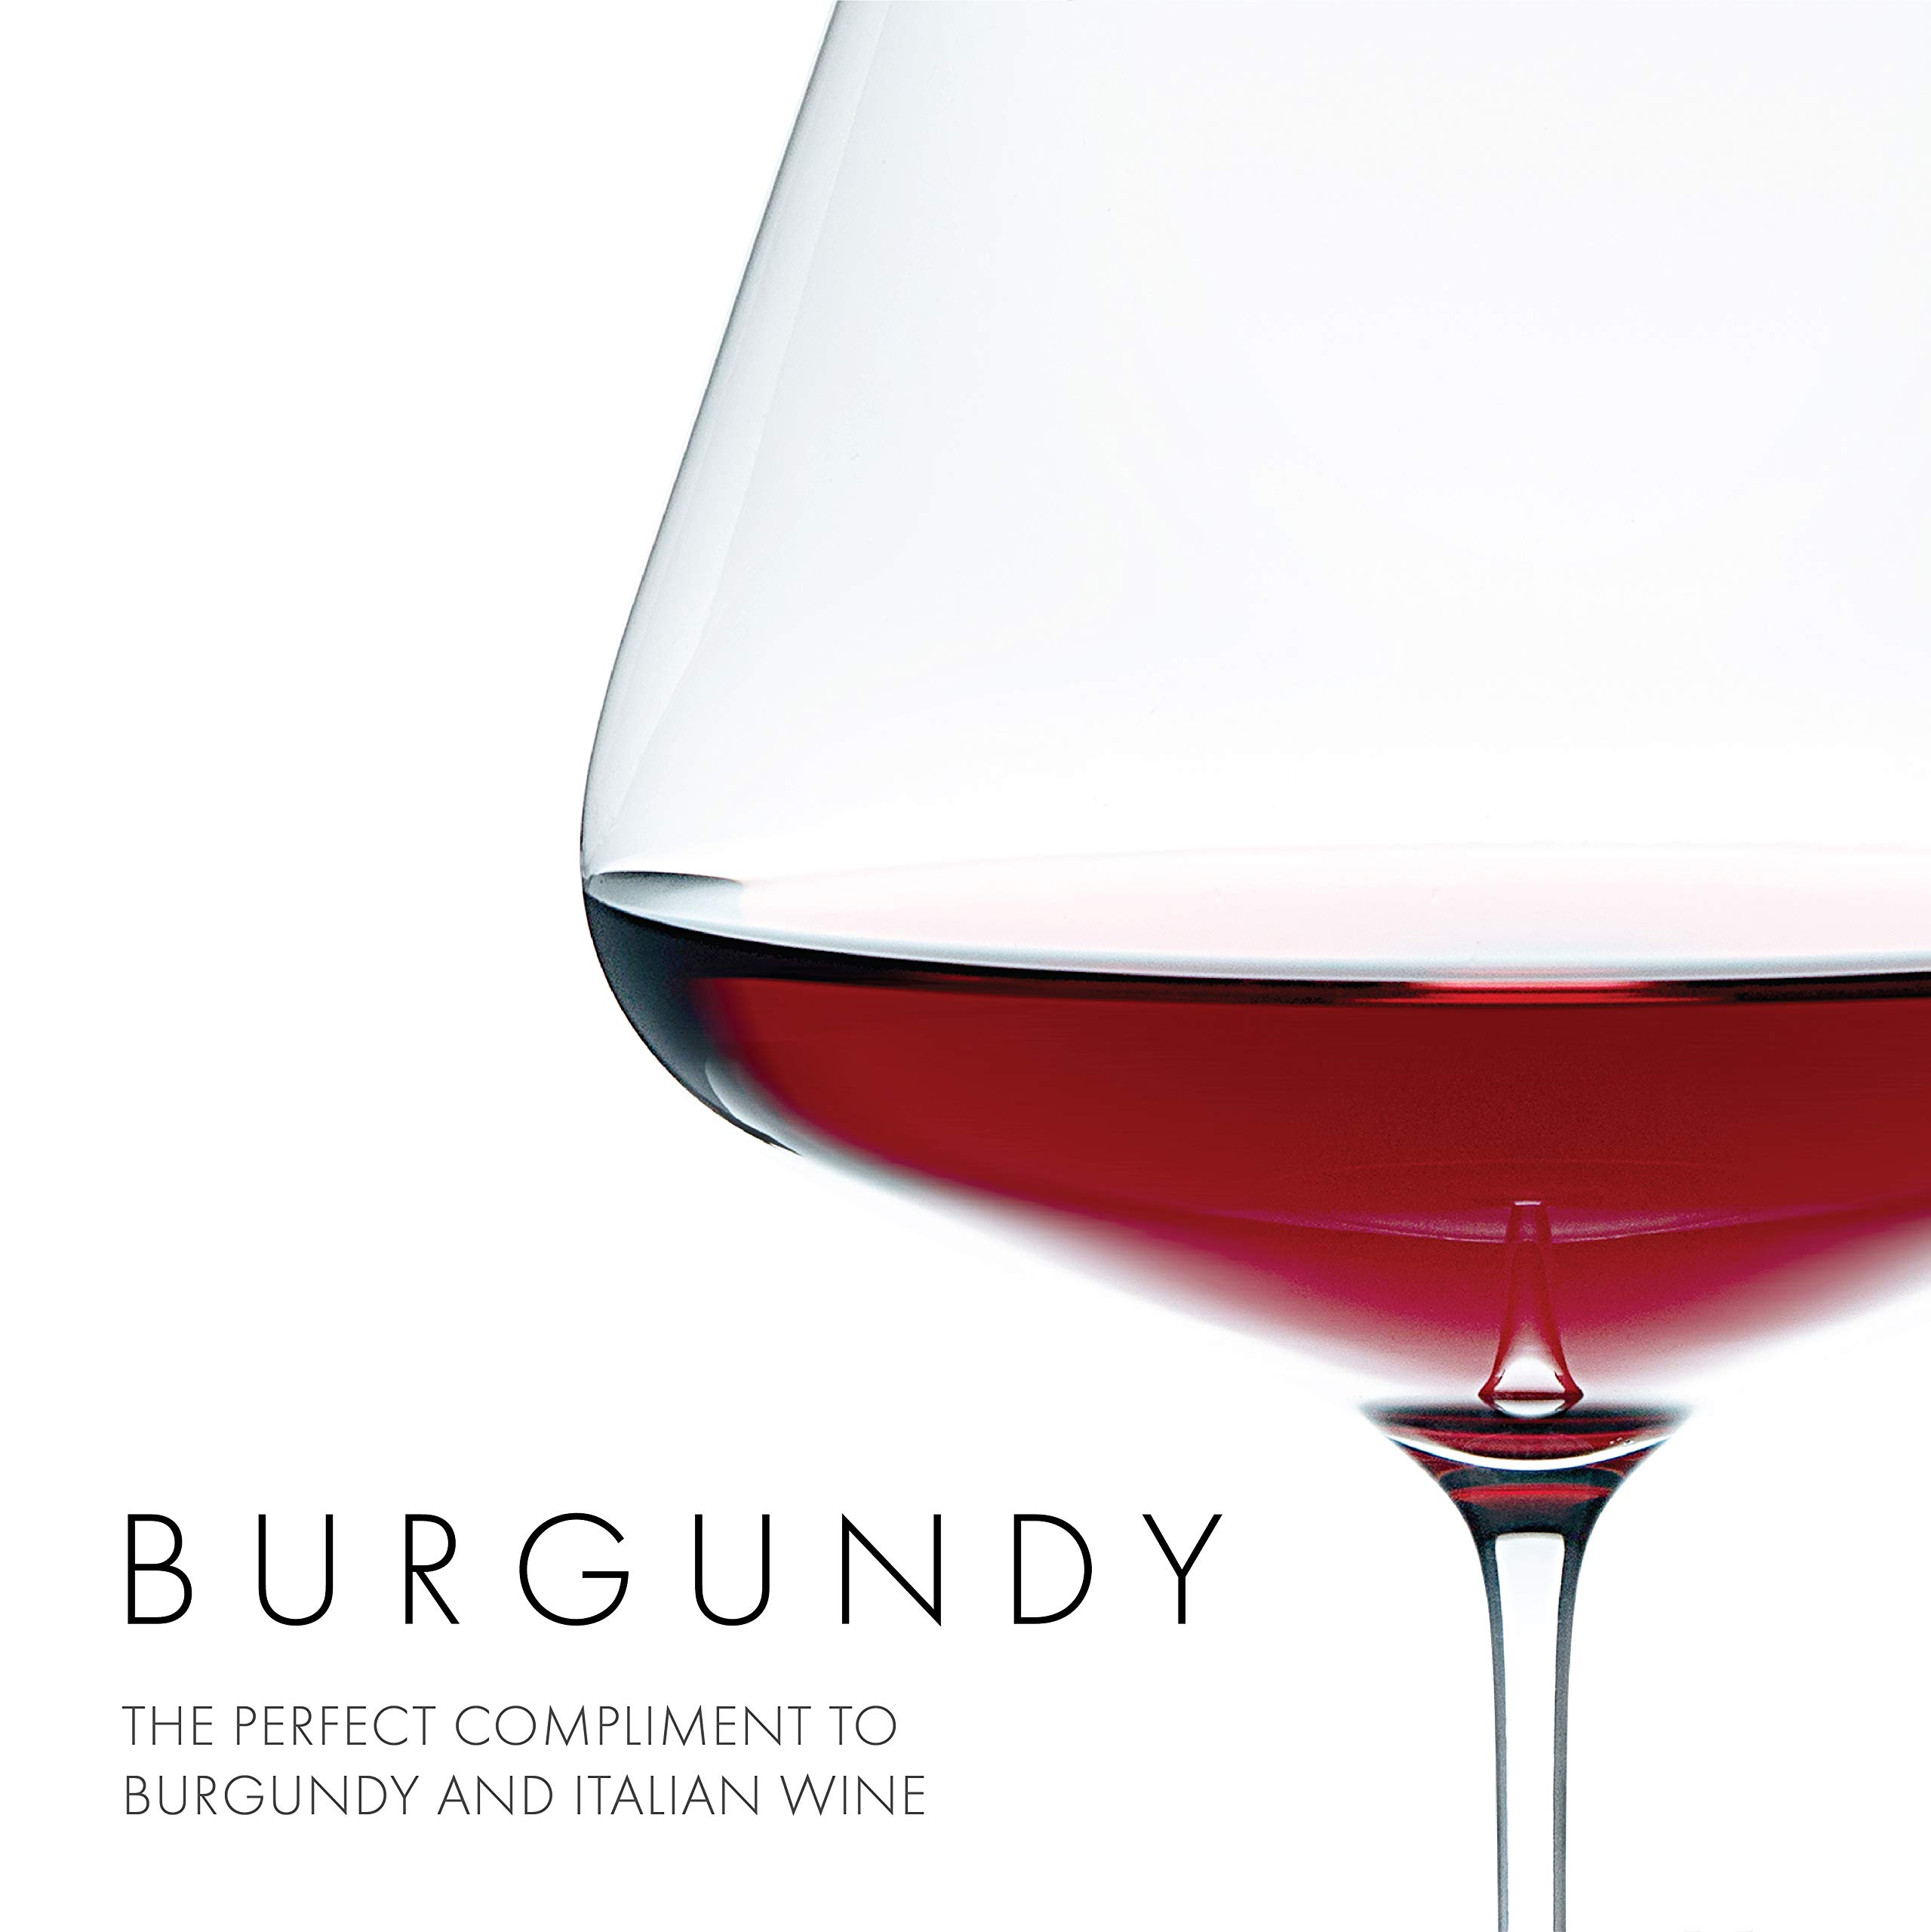 Zalto Denk Art Burgundy Wine Glass Set Of 6 Crystal Glasses For Red Wine Like Chardonnay And Pinot Noir Amazon Sg Home